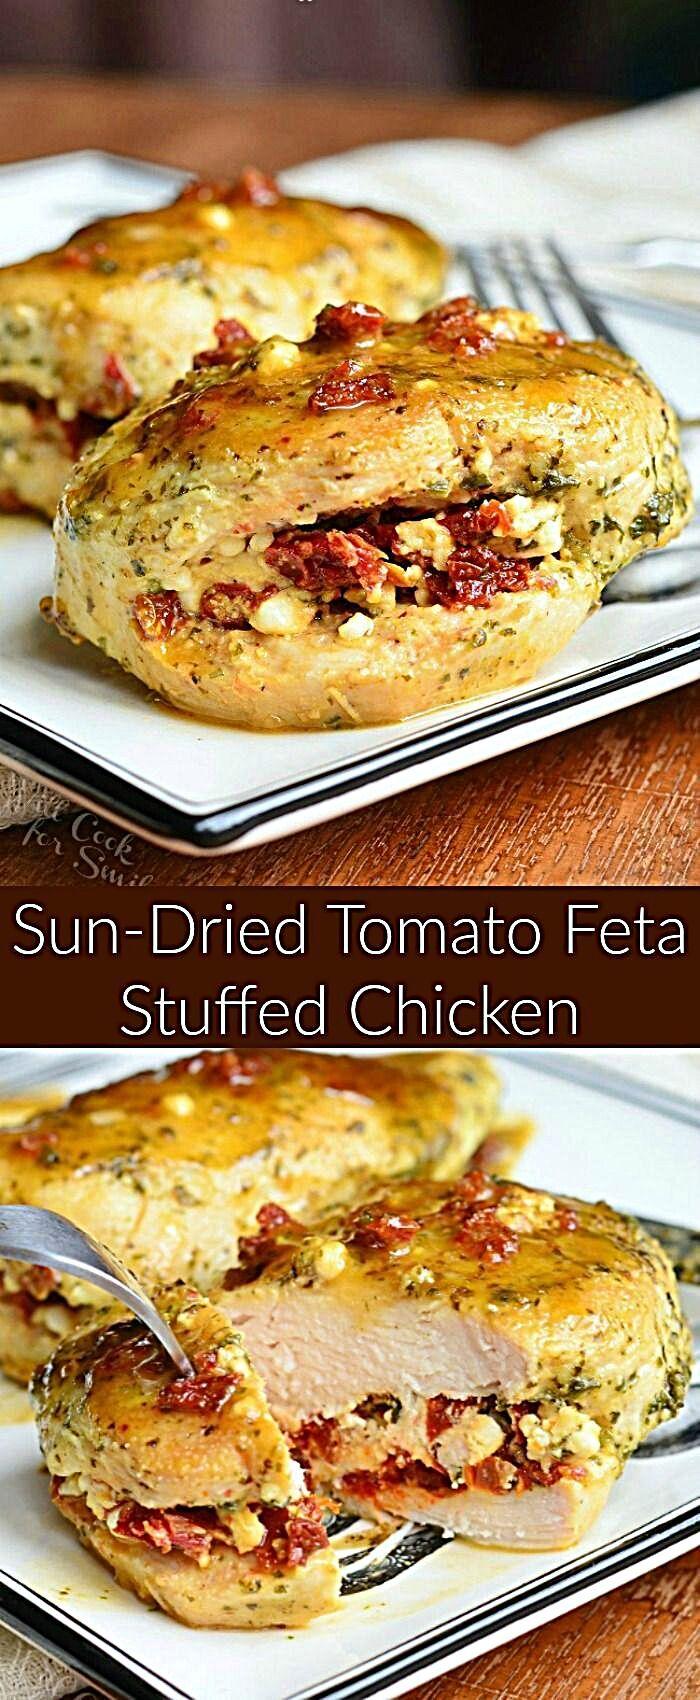 Sun Dried Tomato Feta Stuffed Chicken. Amazing chicken dinner recipe. Juicy chicken breasts are stuf...